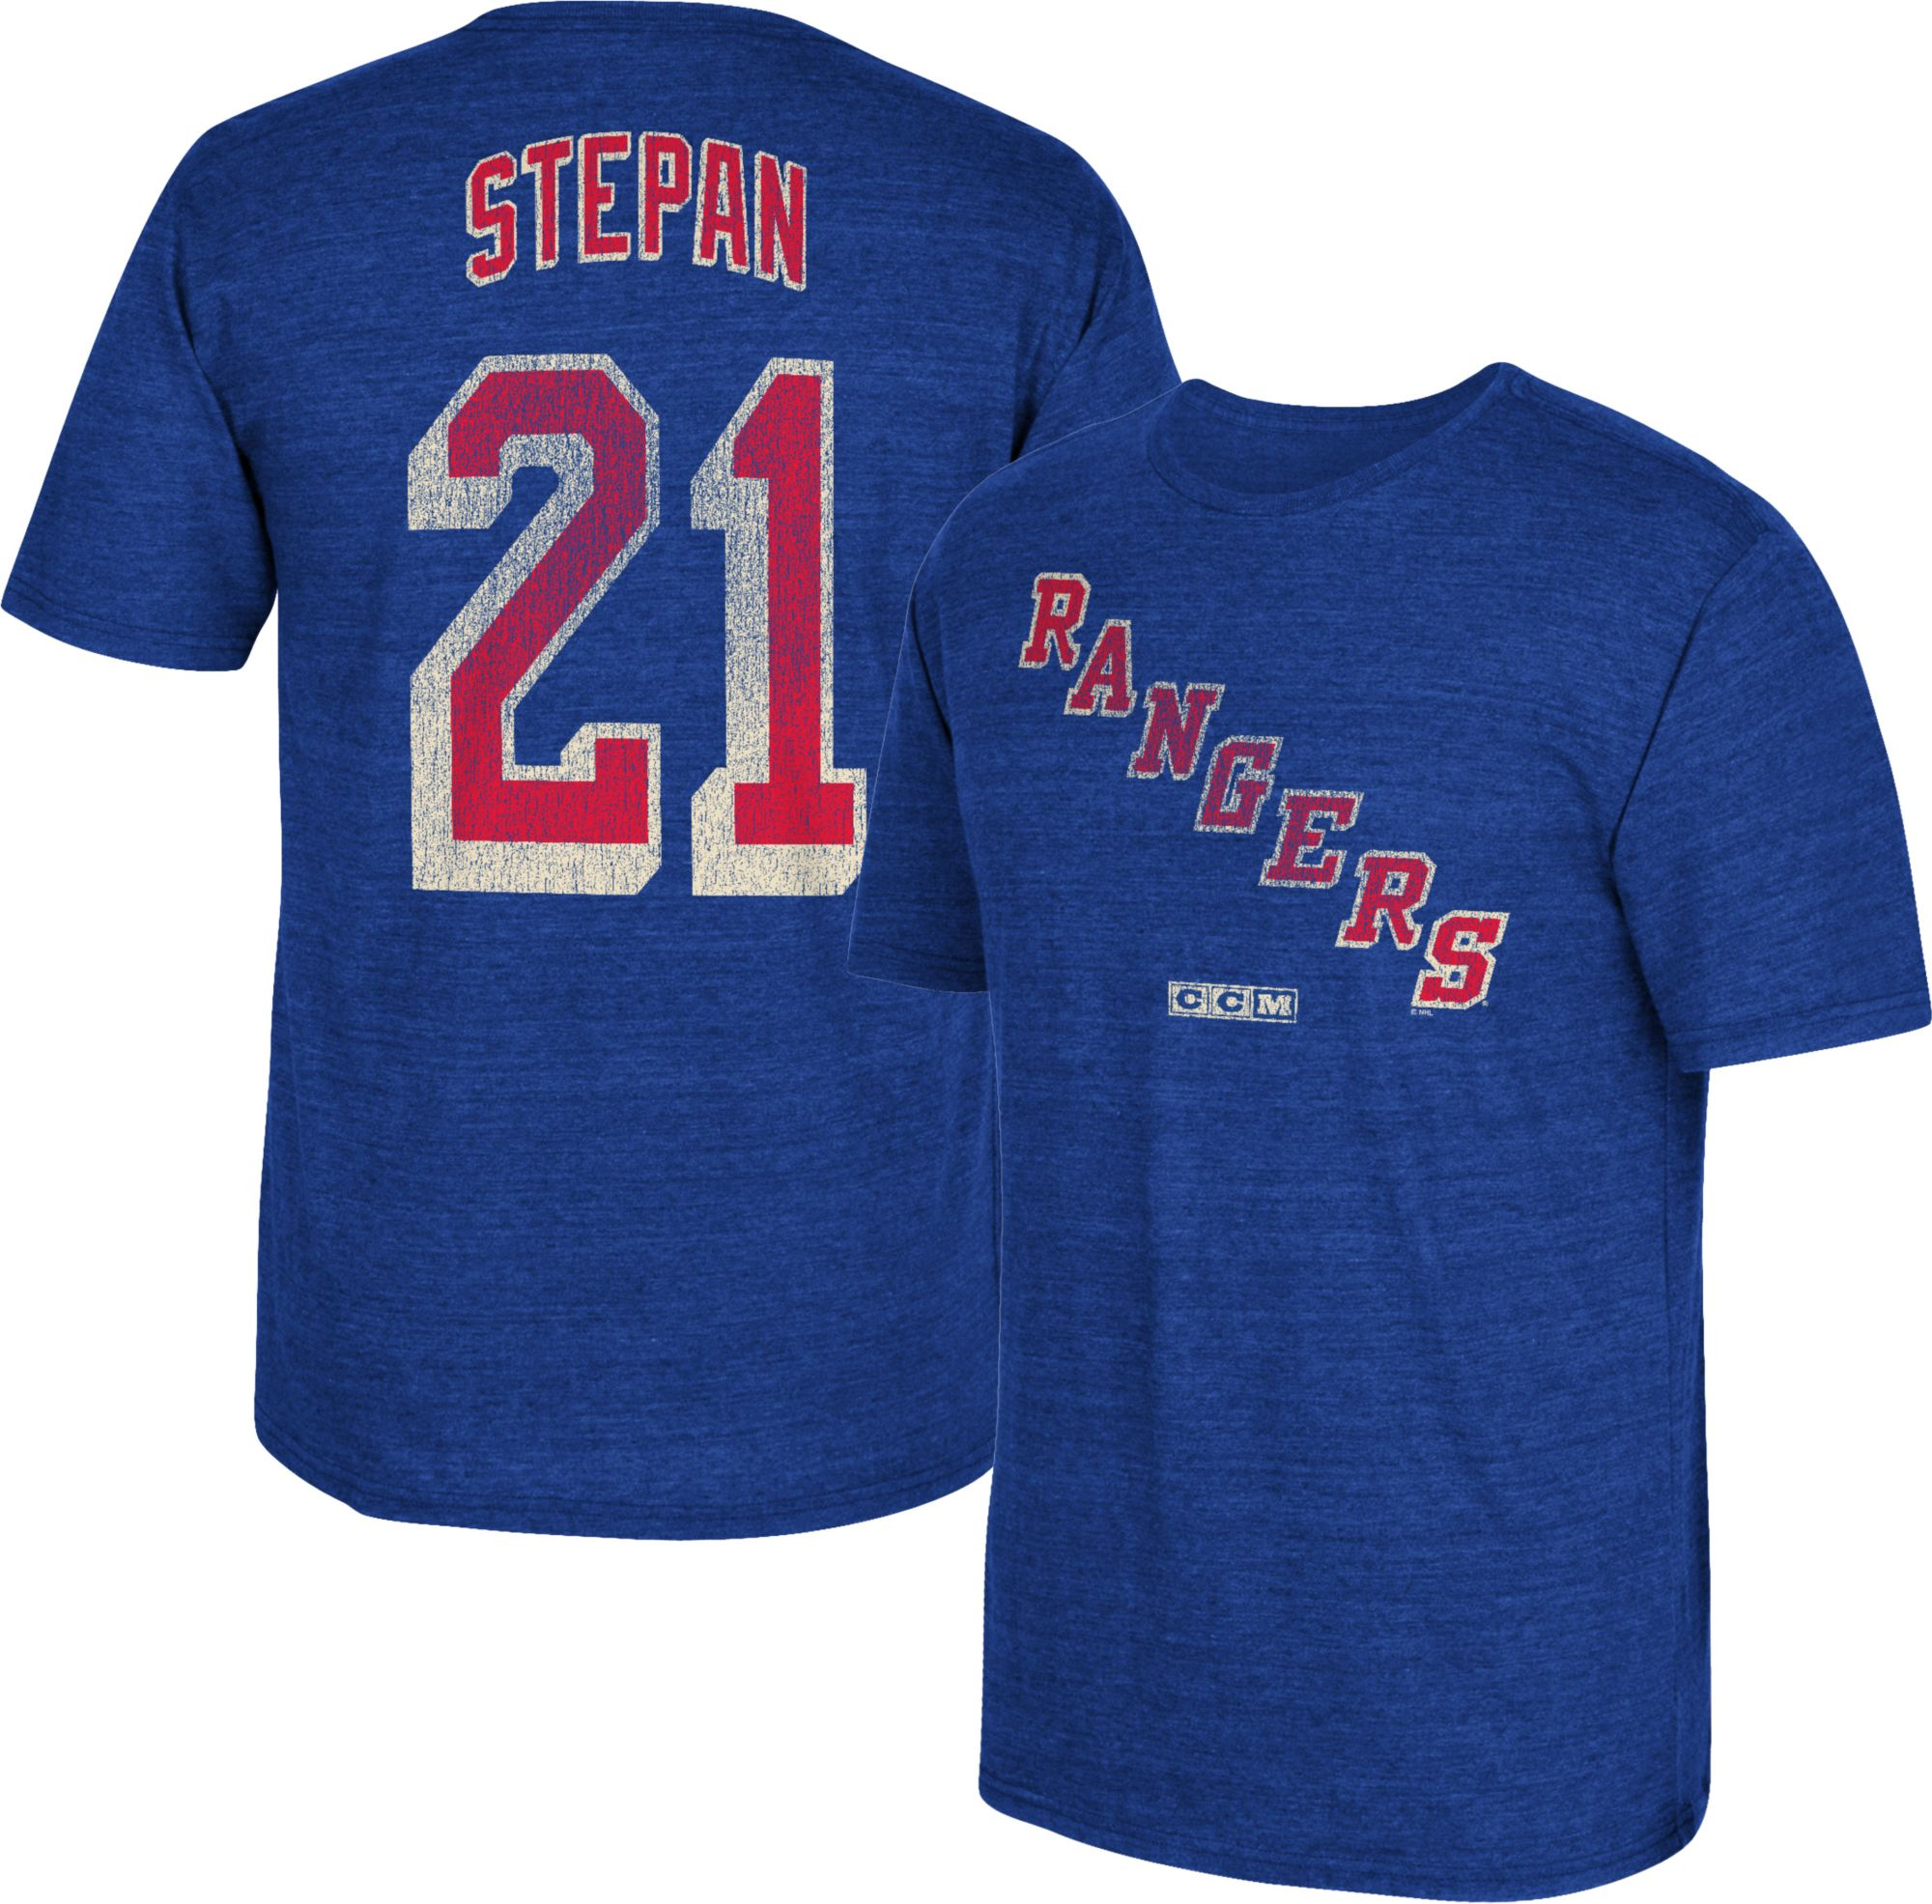 New York Rangers T Shirt Sale - BCD Tofu House 6c8a1eac1